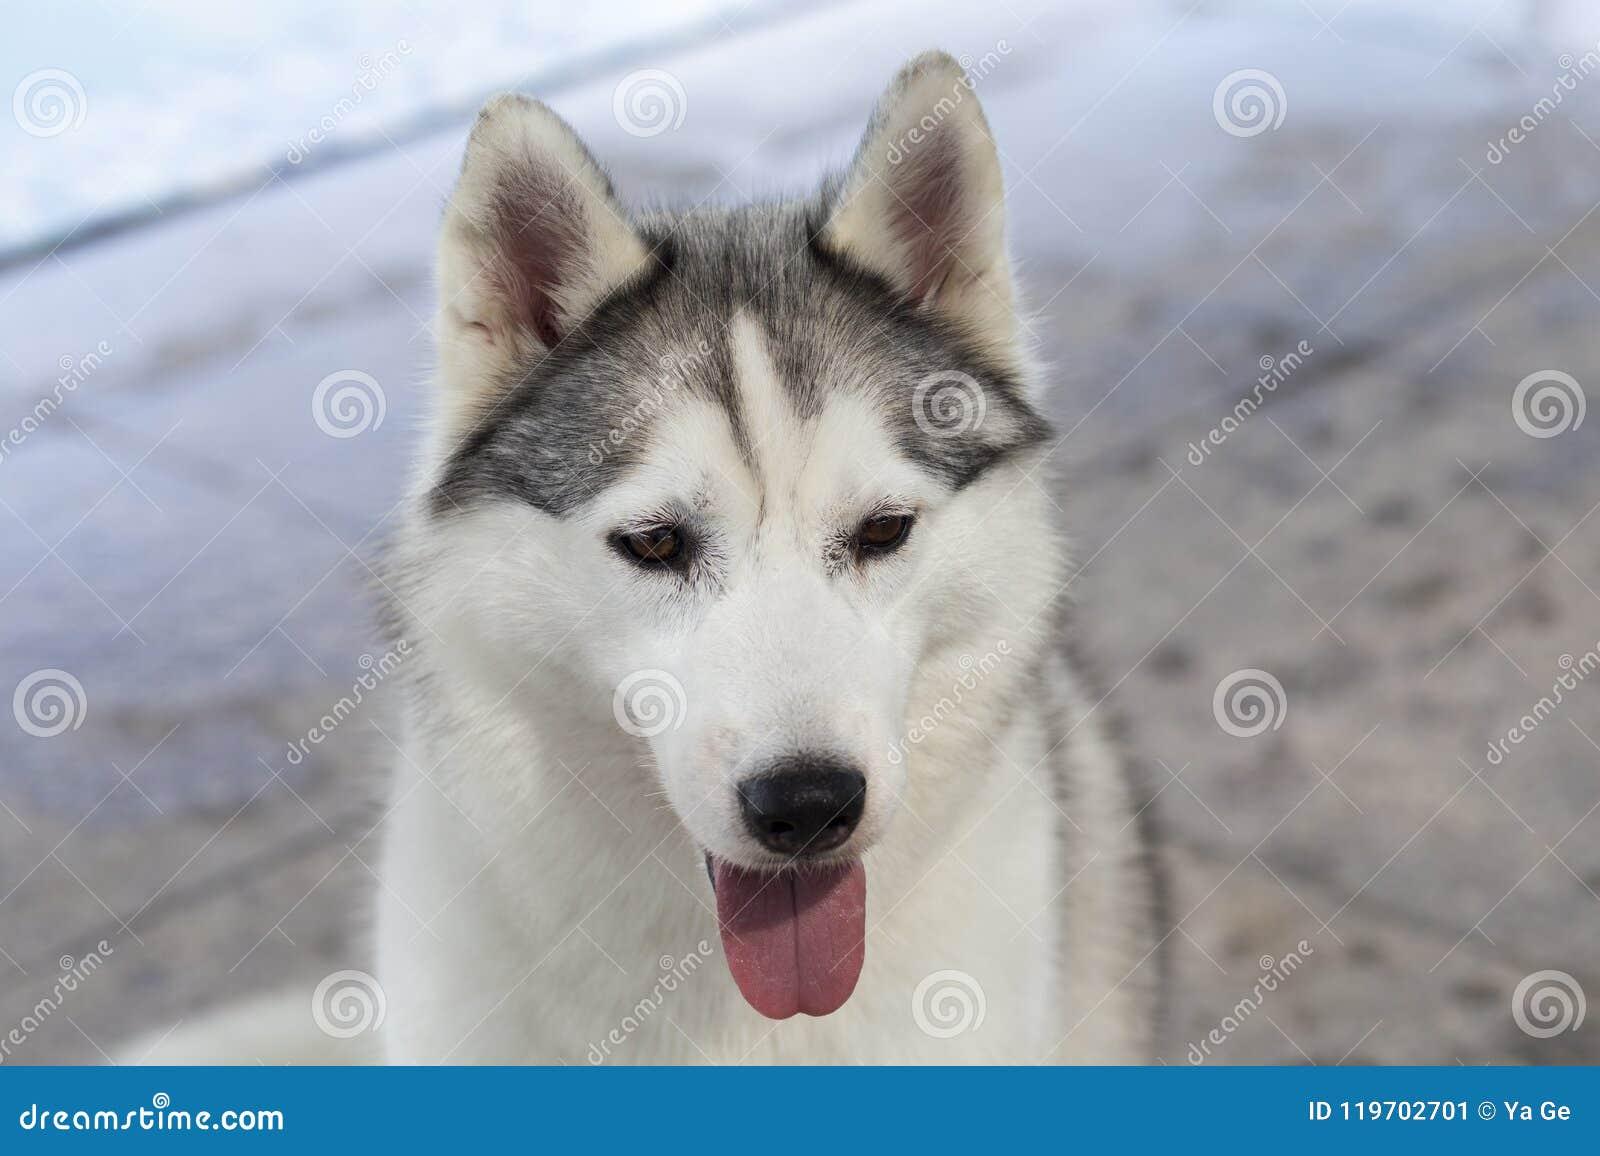 Siberian Husky Dog Stock Image Image Of Pool Outdoors 119702701